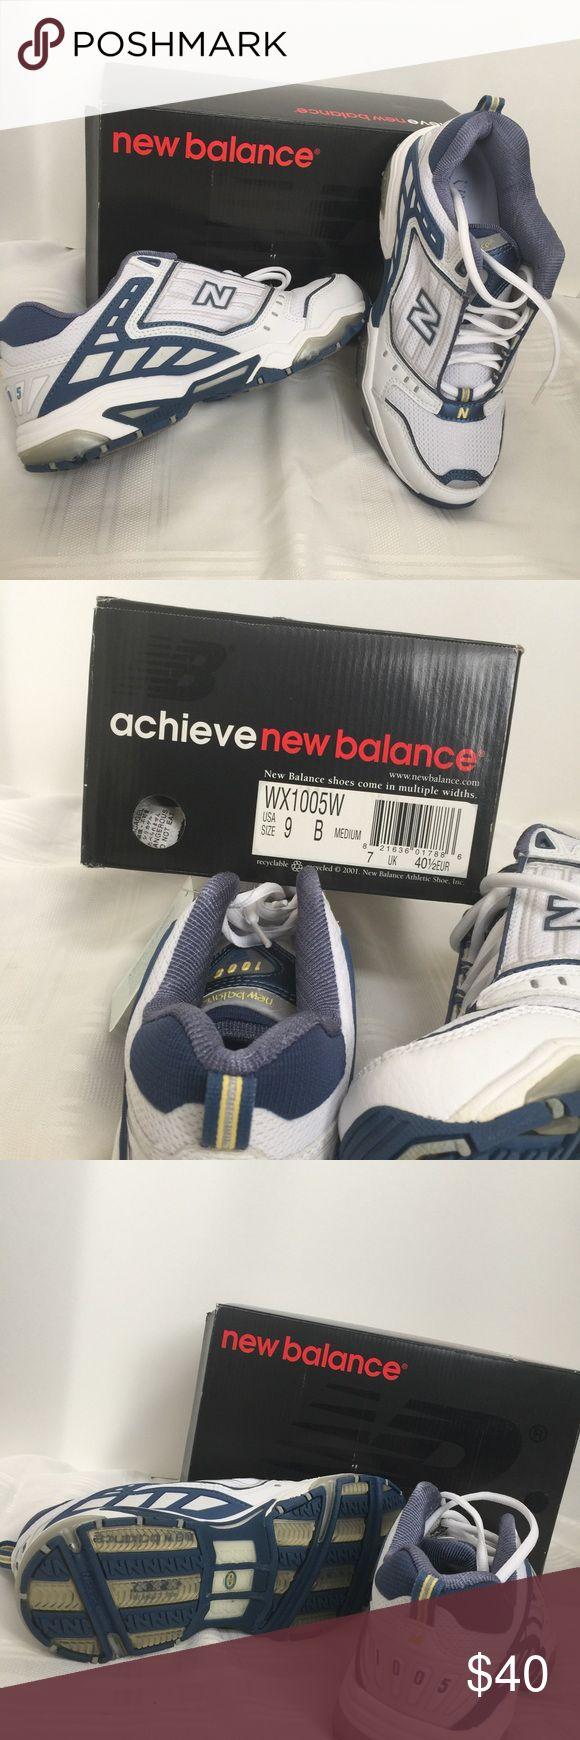 new balance 999 SBS